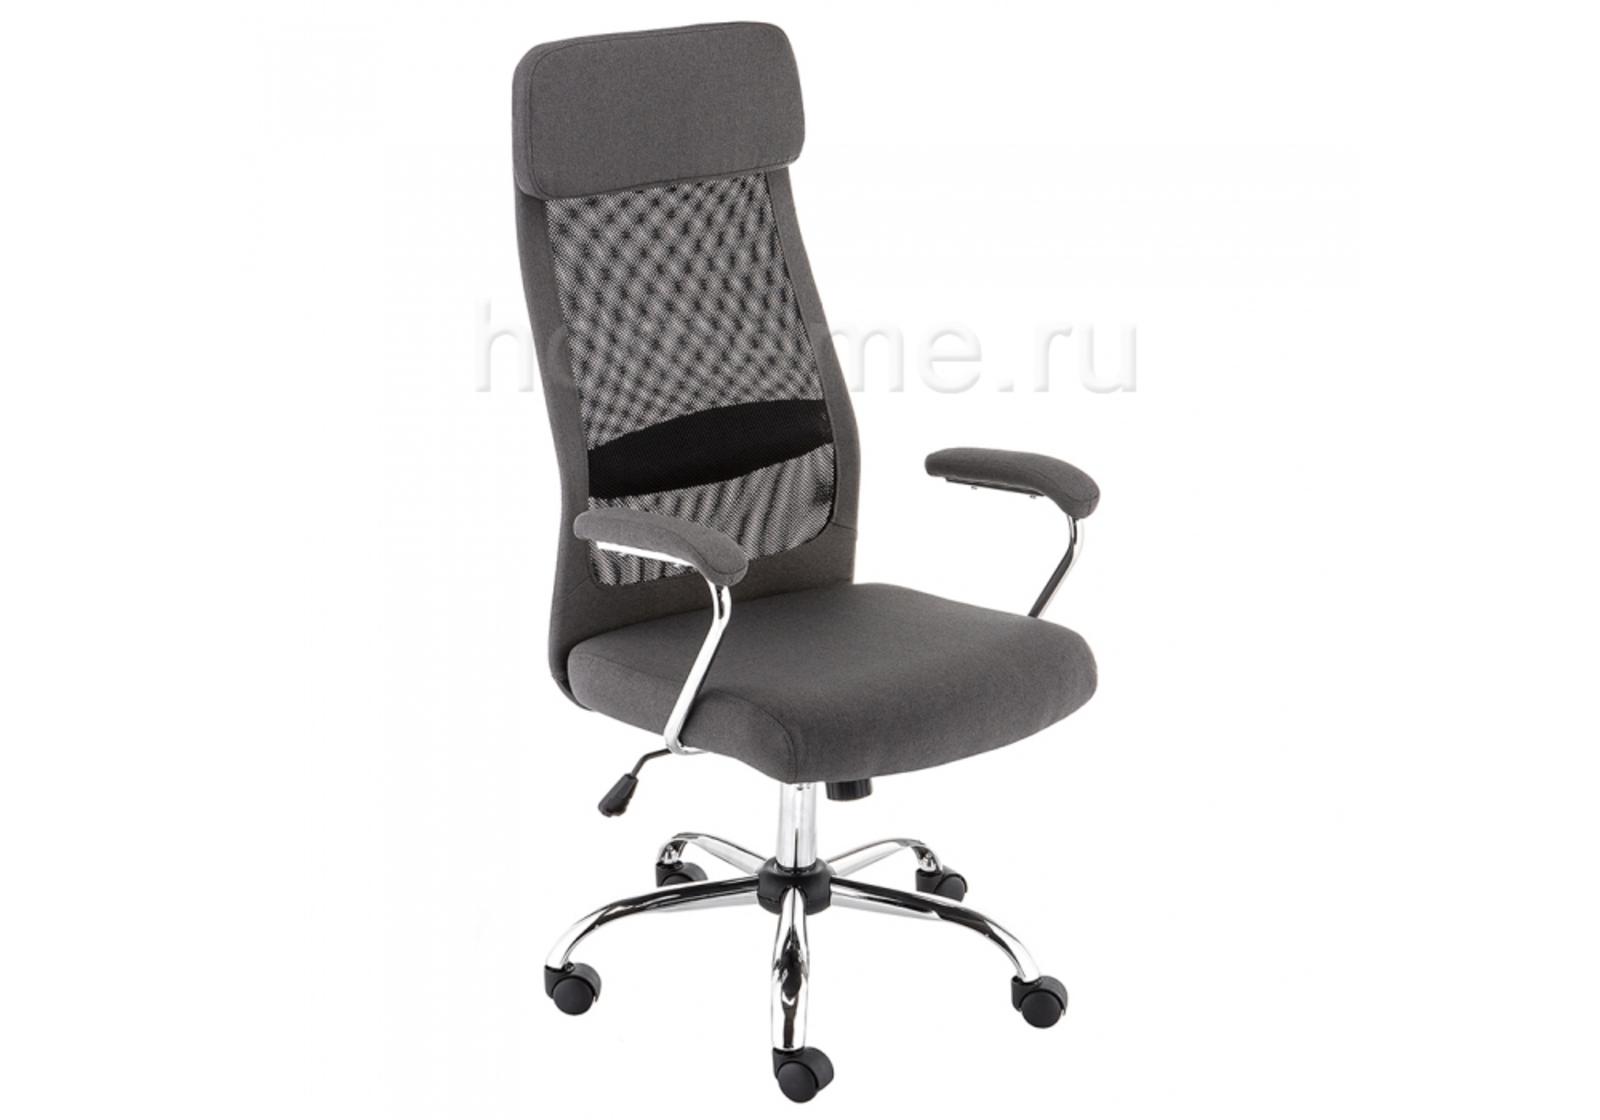 Кресло для офиса HomeMe Sigma темно-серое 11285 от Homeme.ru